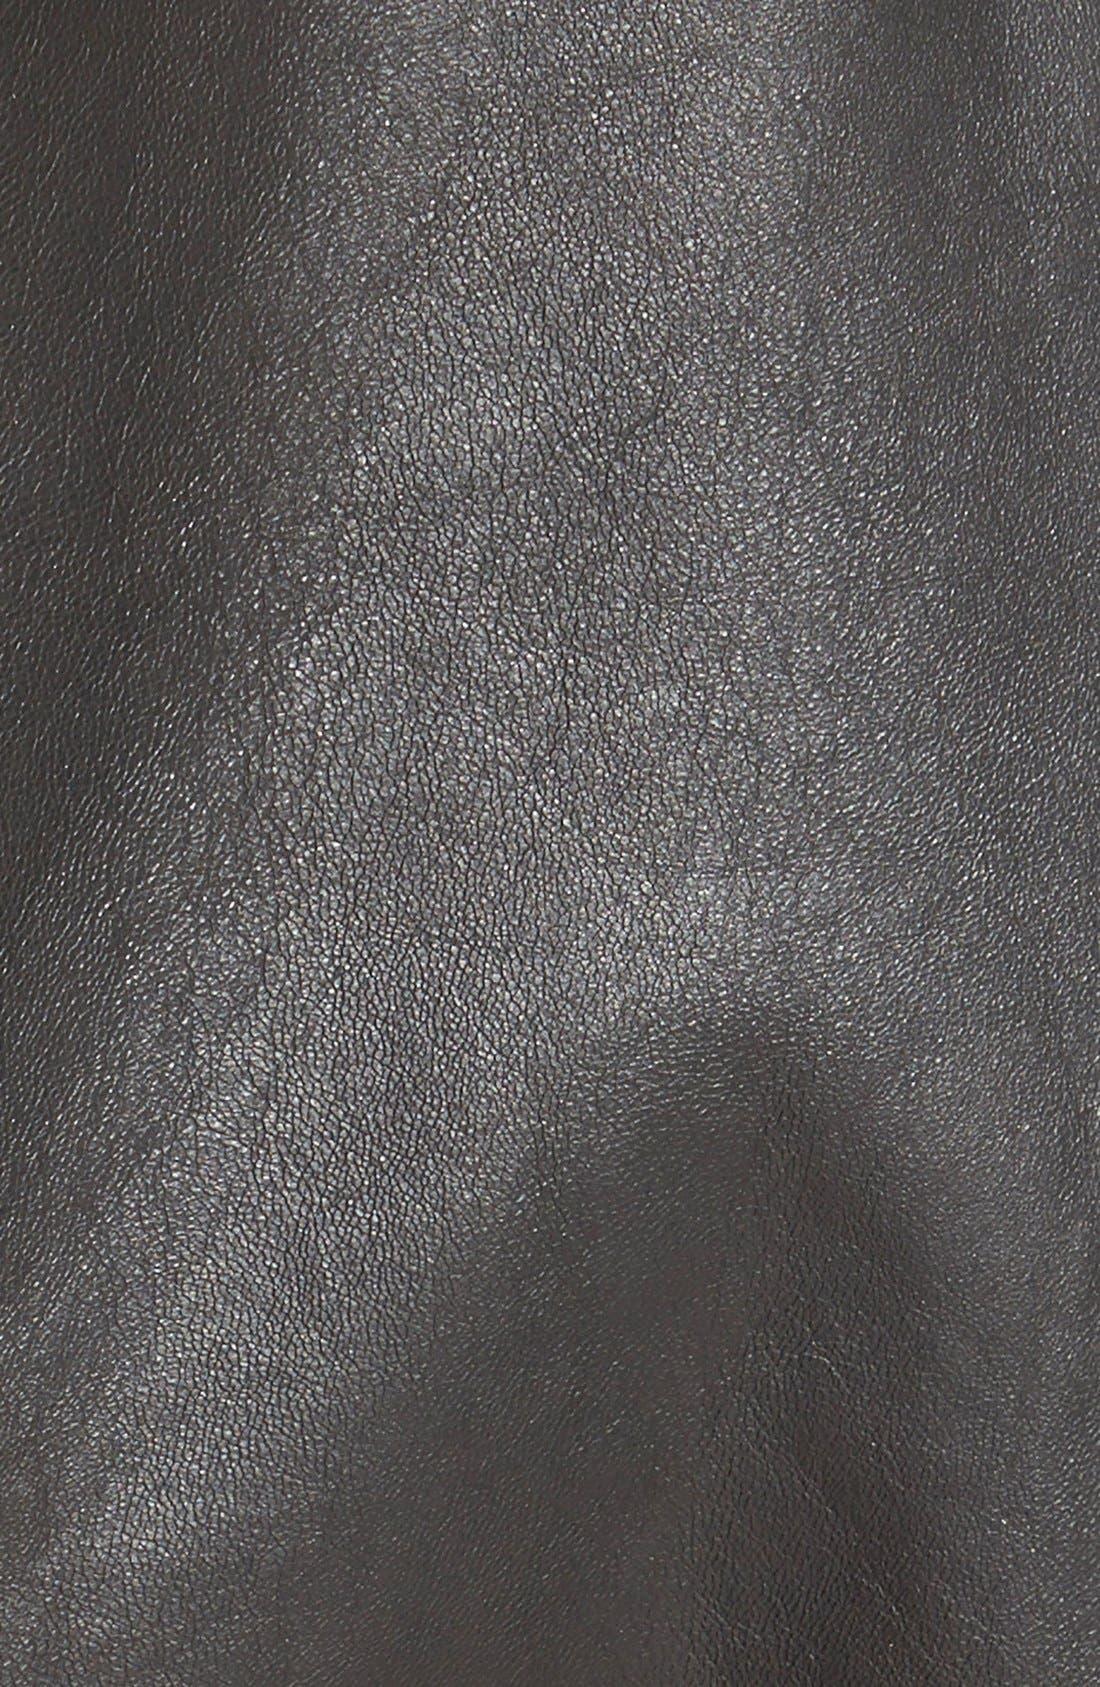 Reversible Suede Jacket,                             Alternate thumbnail 4, color,